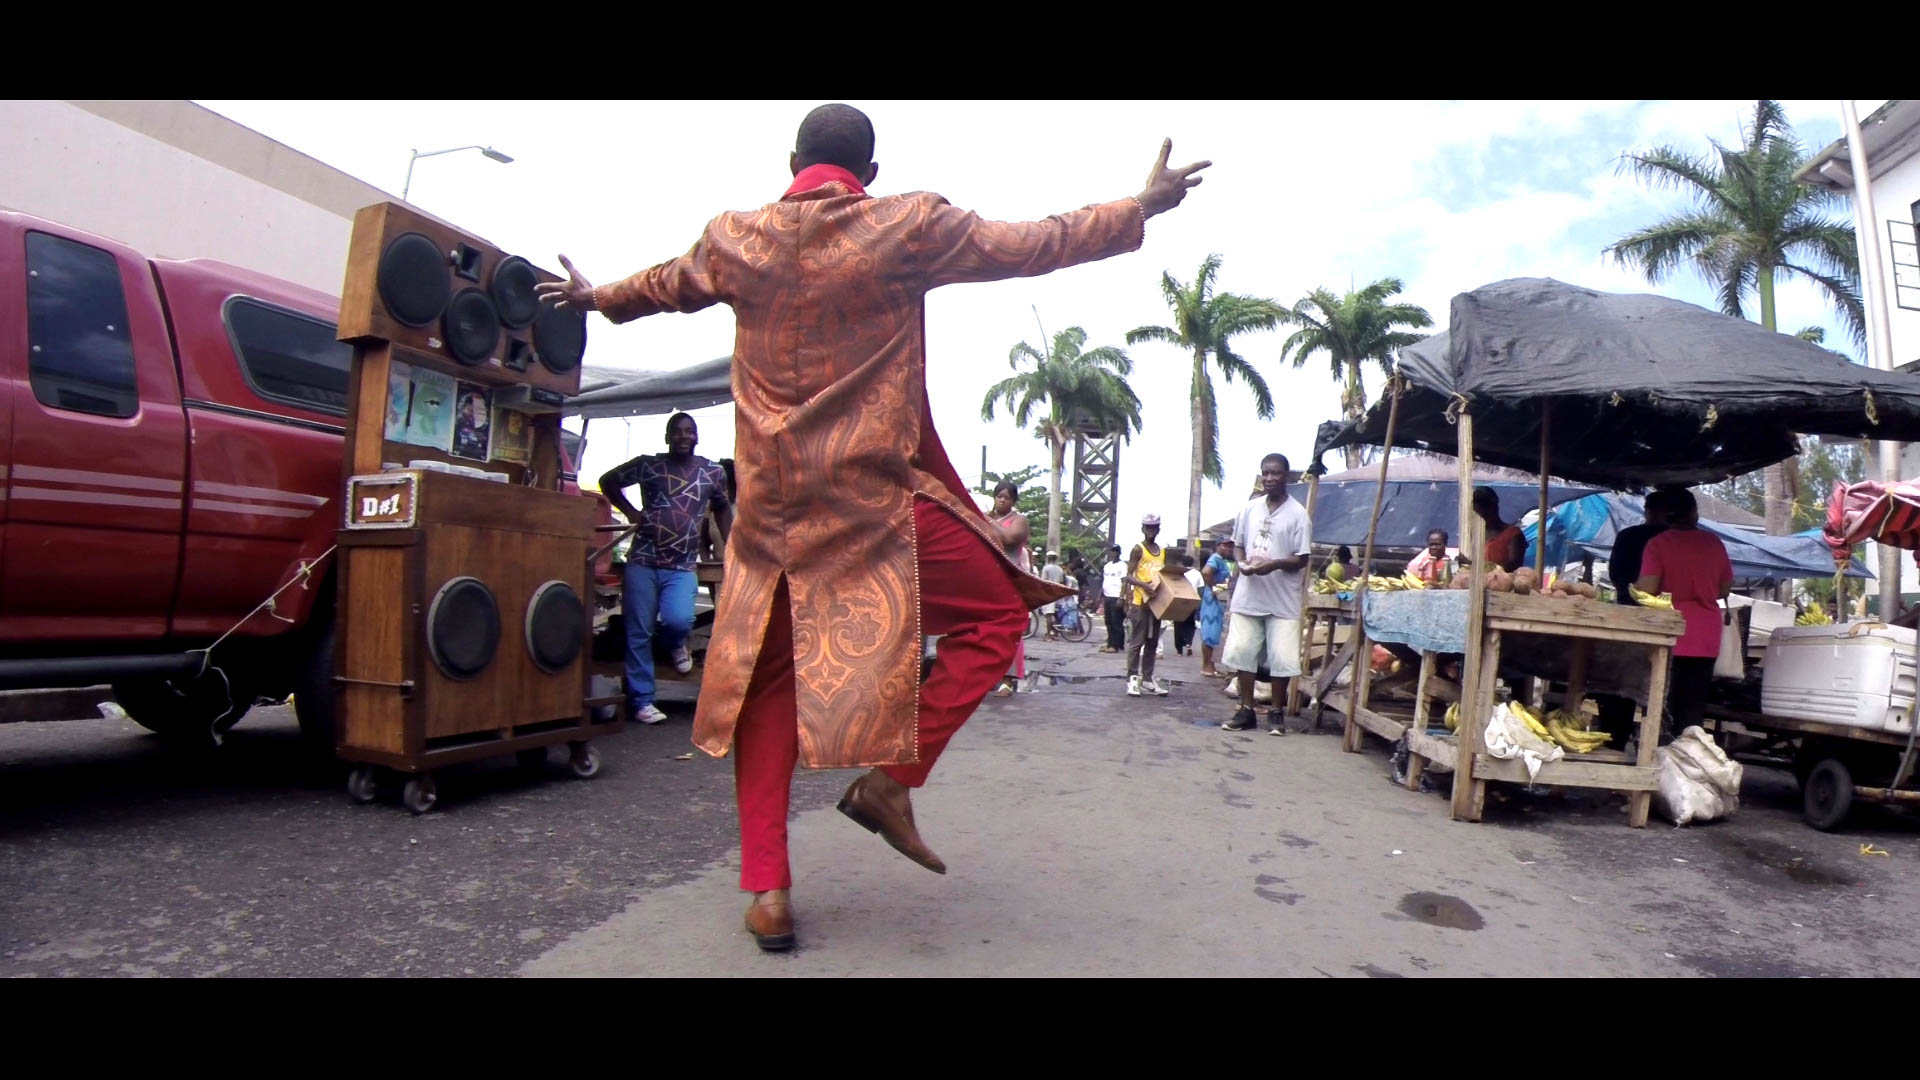 Singer shooting a music video, speakers blasting - Saturday market, Kingstown, SVG - Video Still